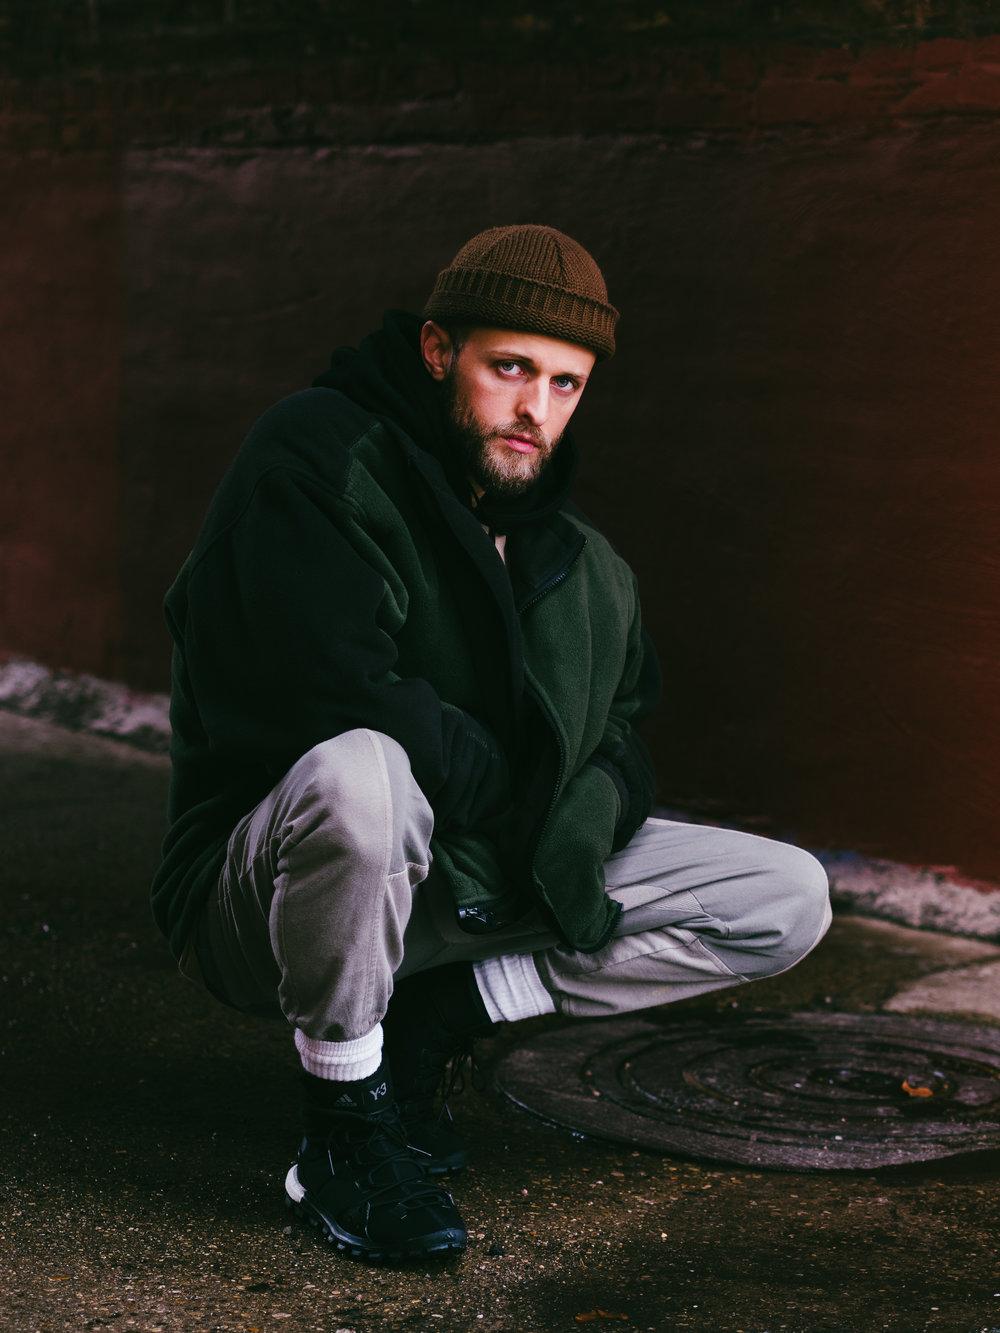 16-12-02__Portfolio_Portrait_025831.JPG